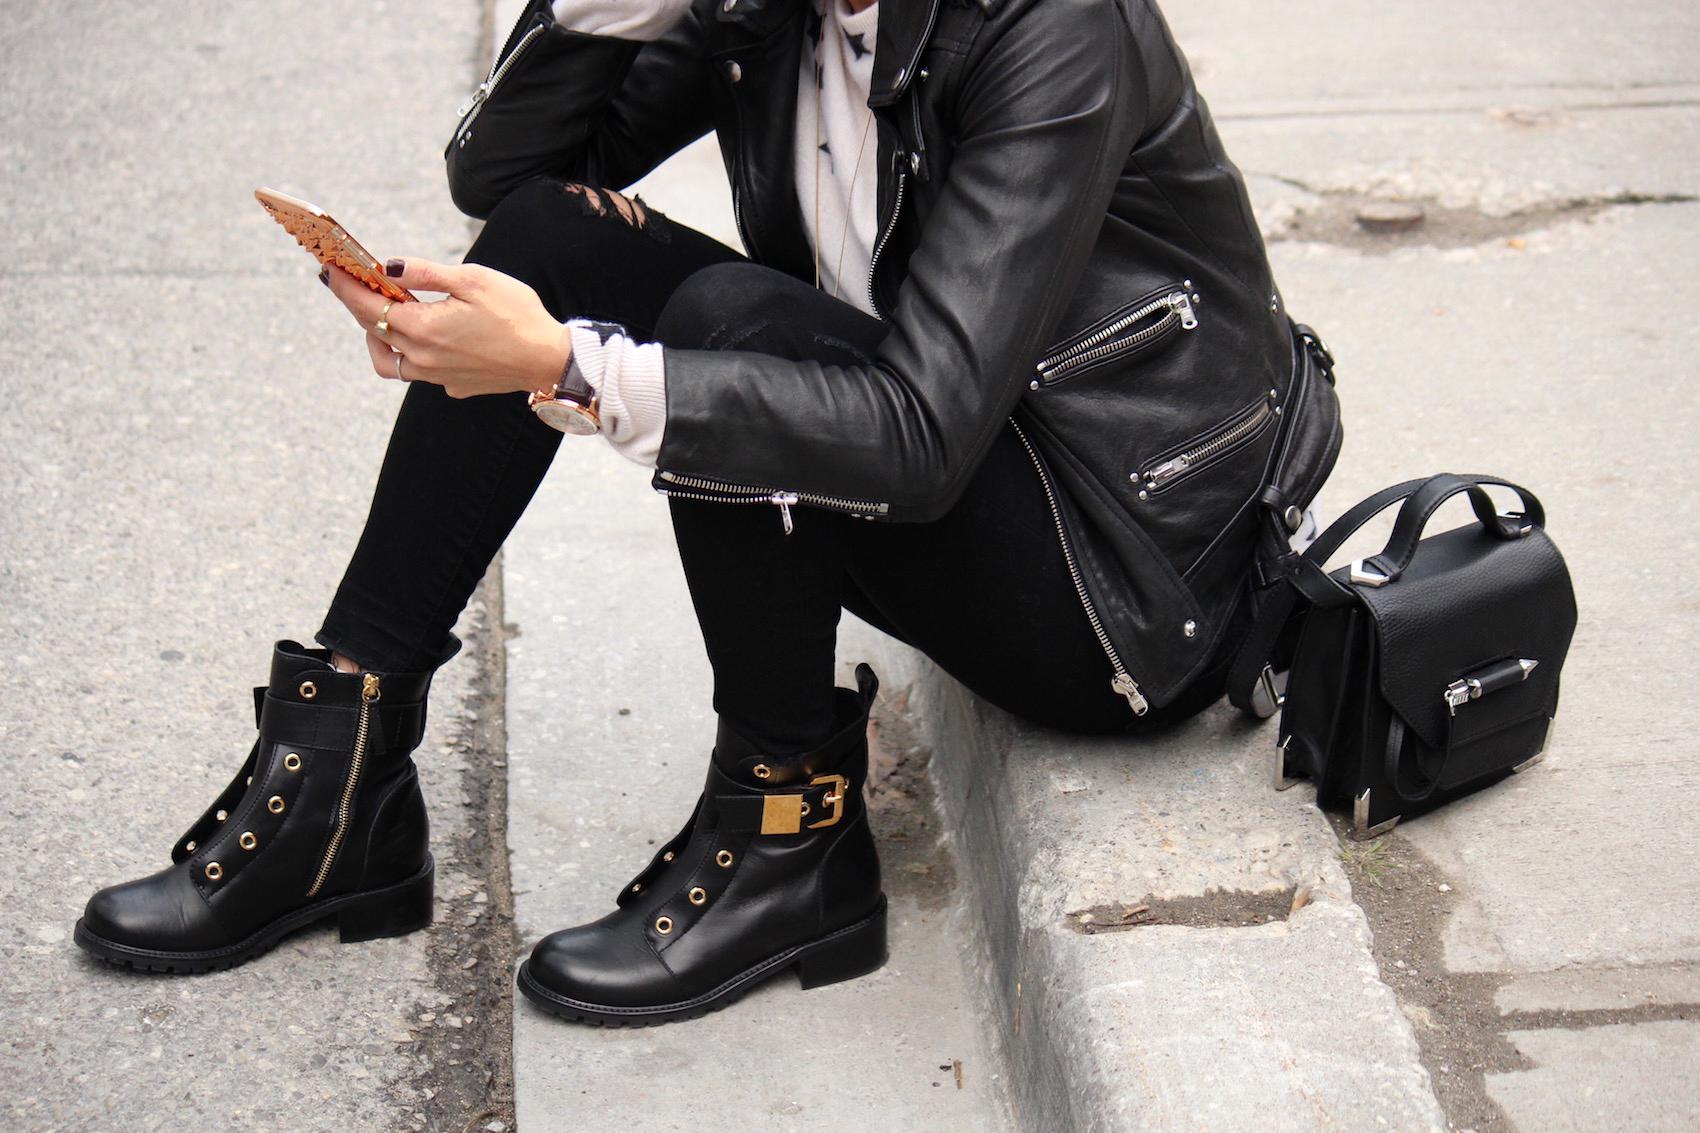 WoahStyle.com_Glam Combat Boots_Giuseppe Zanotti_Zara jeans_Equipment cashmere star sweater_The Kooples leather jacket_Mackage Rubie bag_StreetStyle_Street_Style_OOTD_Toronto_Fashion_Blogger_5707.jpg